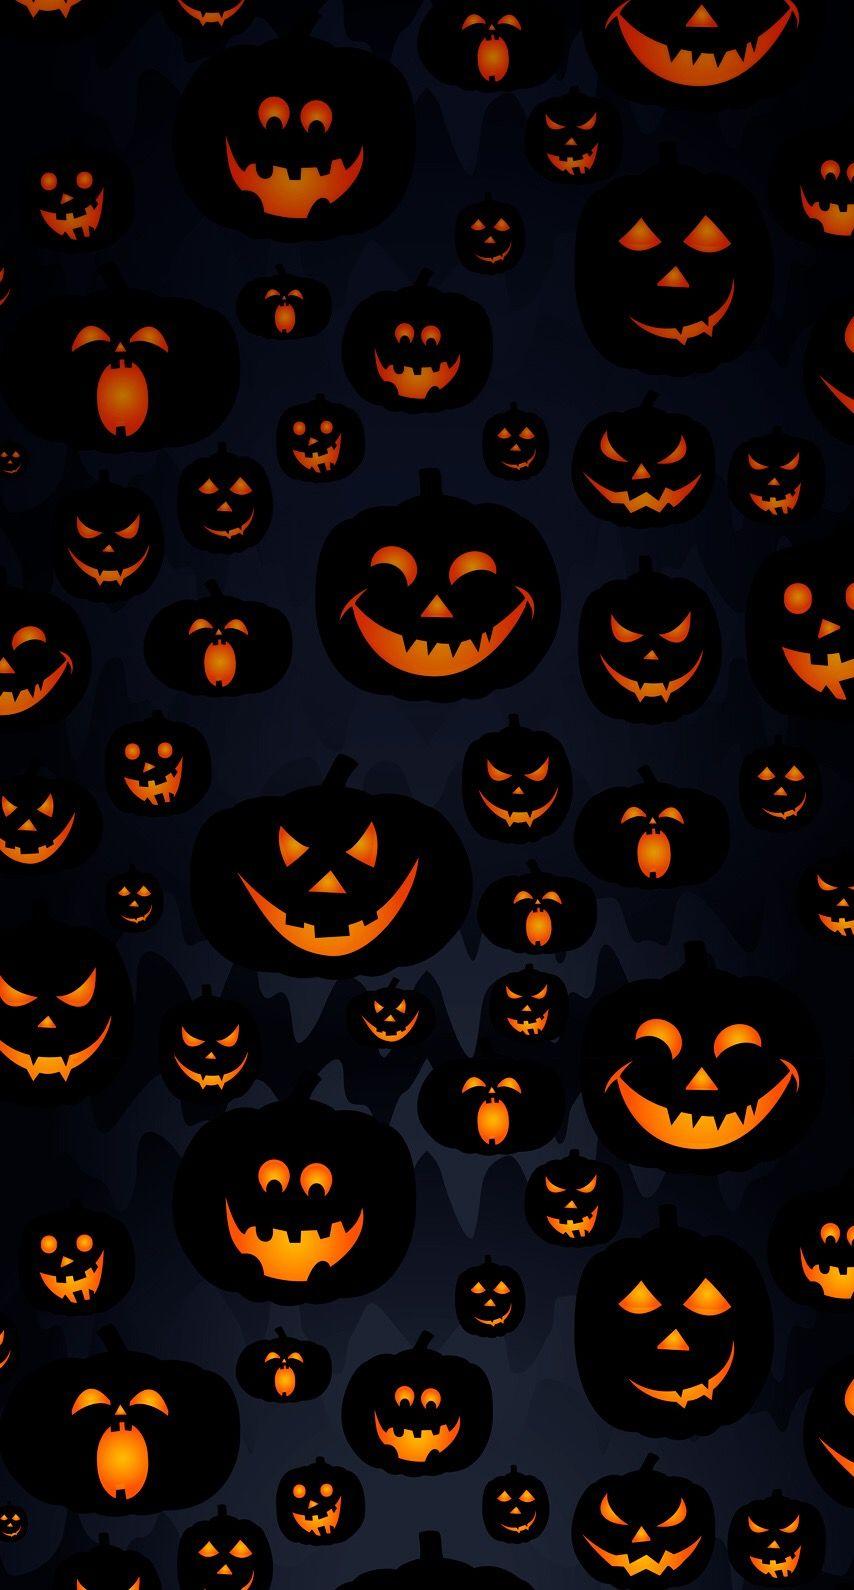 61+] Halloween Wallpaper Pics on WallpaperSafari